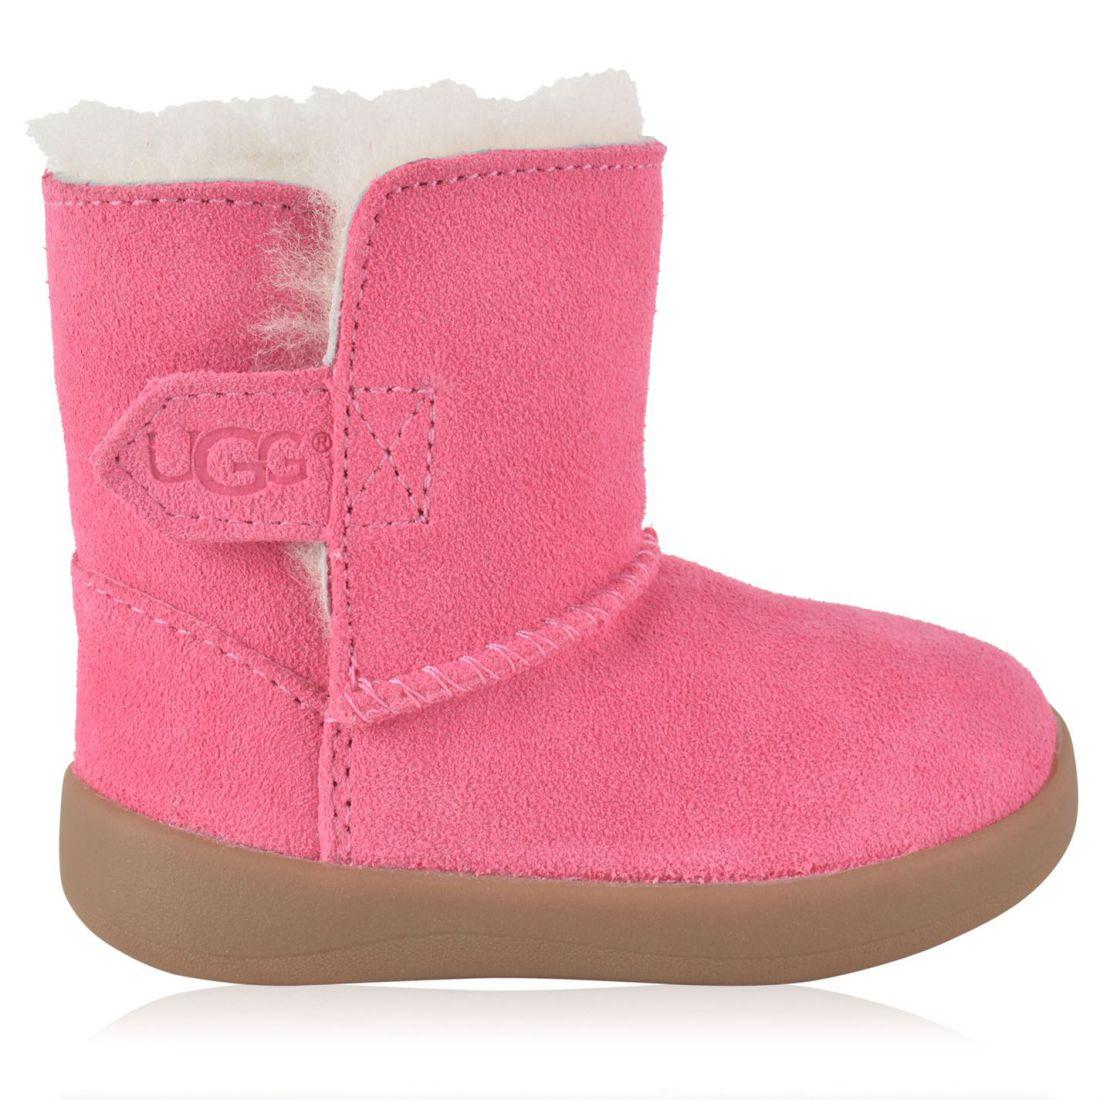 cebe29515e6 Details about Ugg Kids Girls Keelan Boots Snug